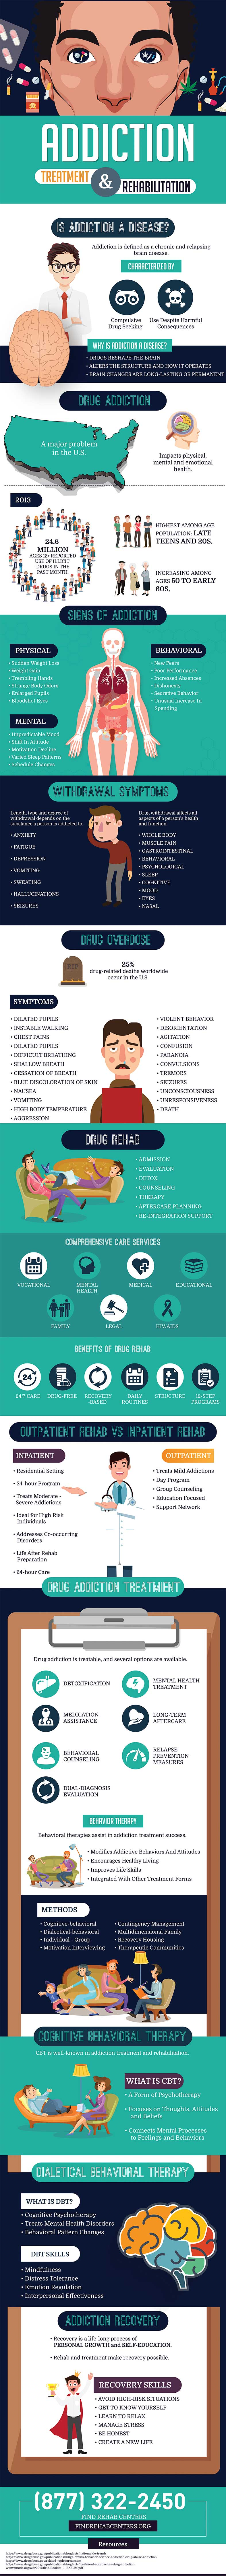 Addiction Treatment and Rehabilitation